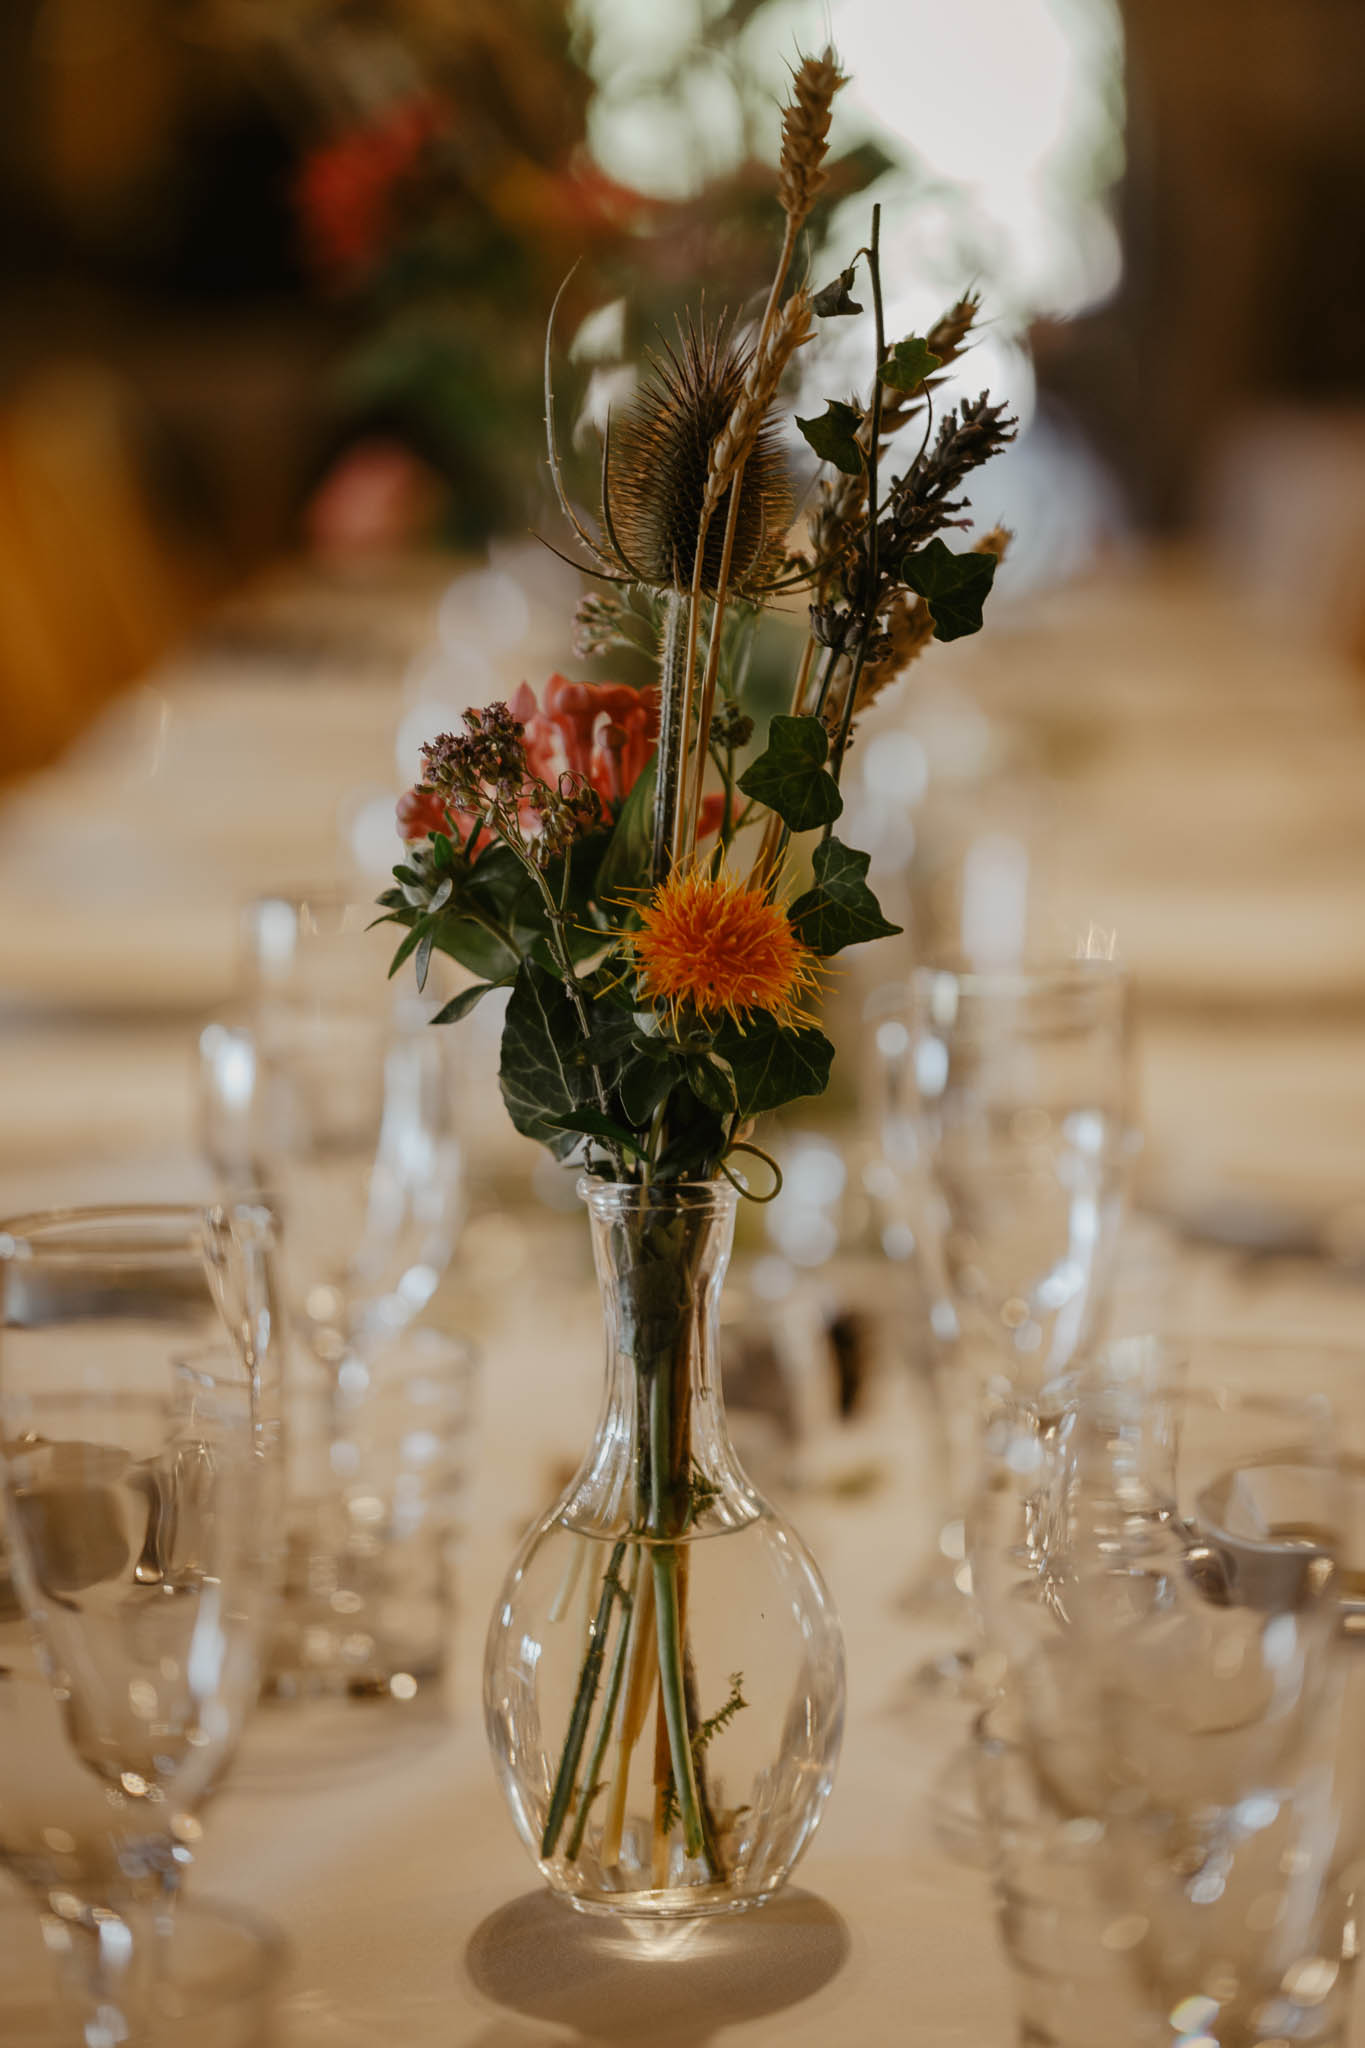 mariage-preparatifs-cantal-ingold-6.jpg